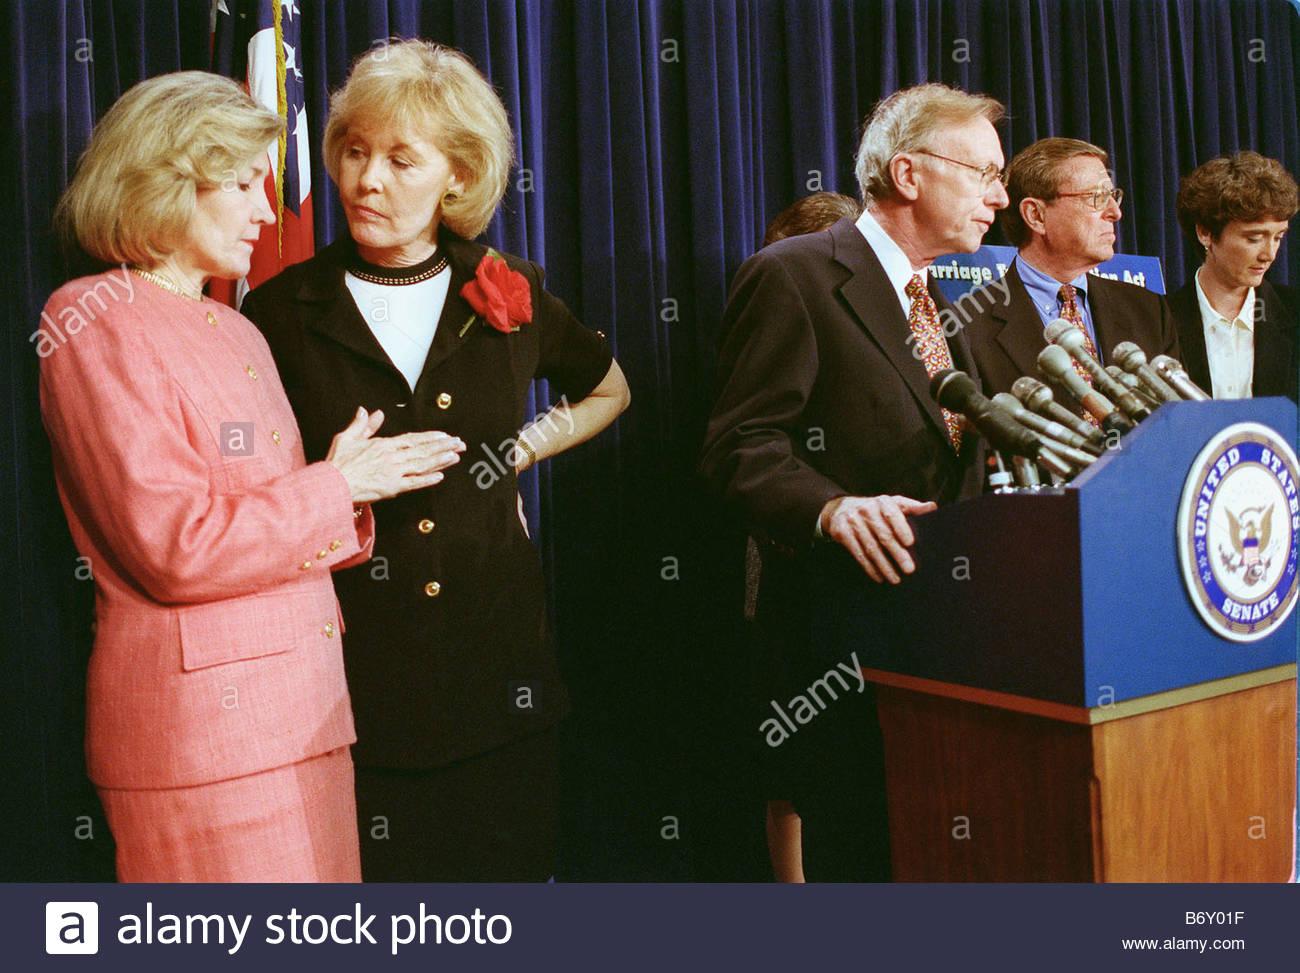 7 28 99 konsultieren STEUERSENKUNG Sen Kay Bailey Hutchison R Texas und Jennifer Dunn R Wash links während Stockbild